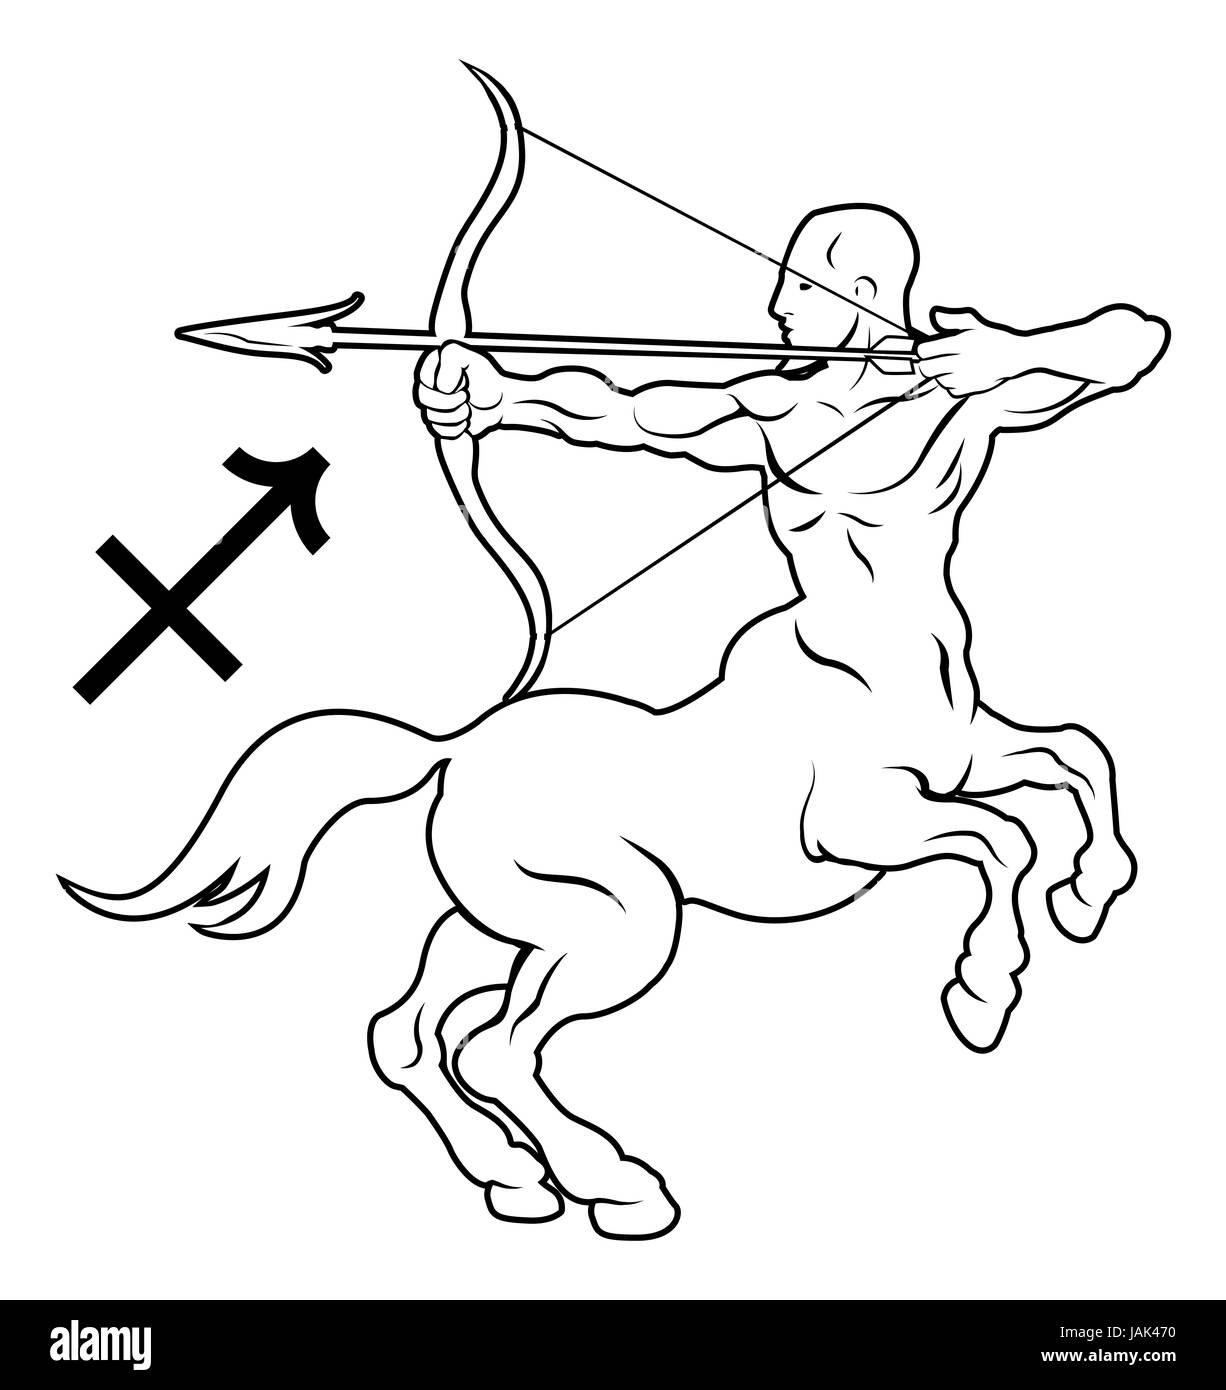 Illustration of Sagittarius the archer or centaur zodiac horoscope astrology sign - Stock Image